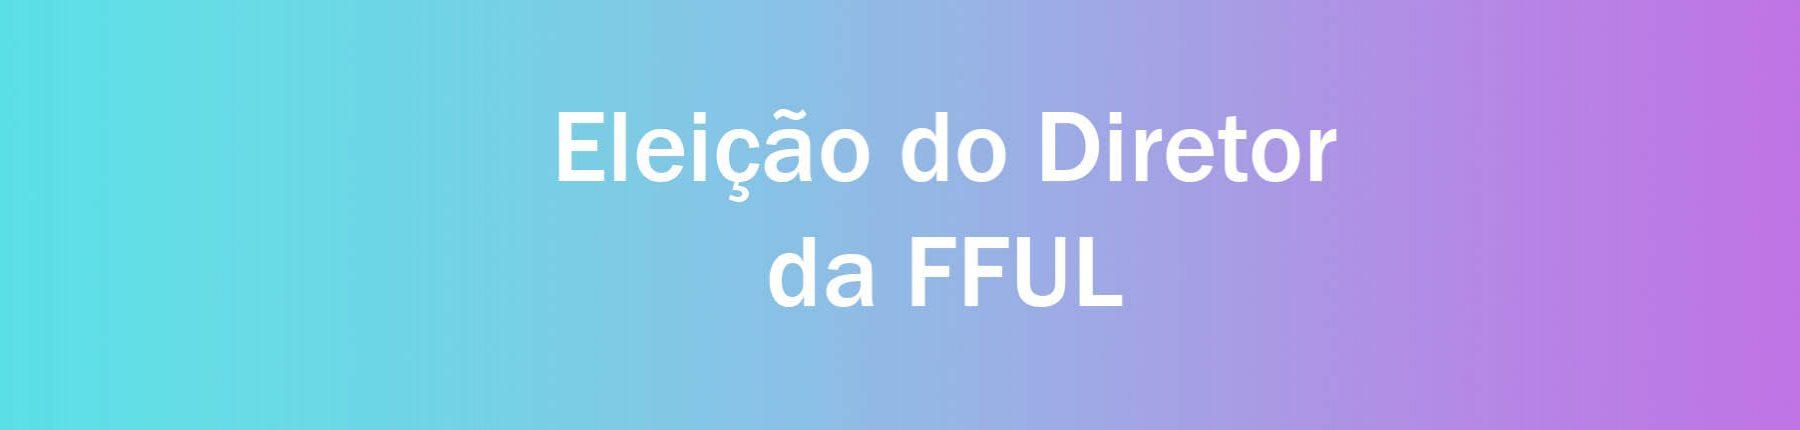 https://www.ff.ulisboa.pt/wp-content/uploads/2020/03/eleições_banner-375x430.jpg